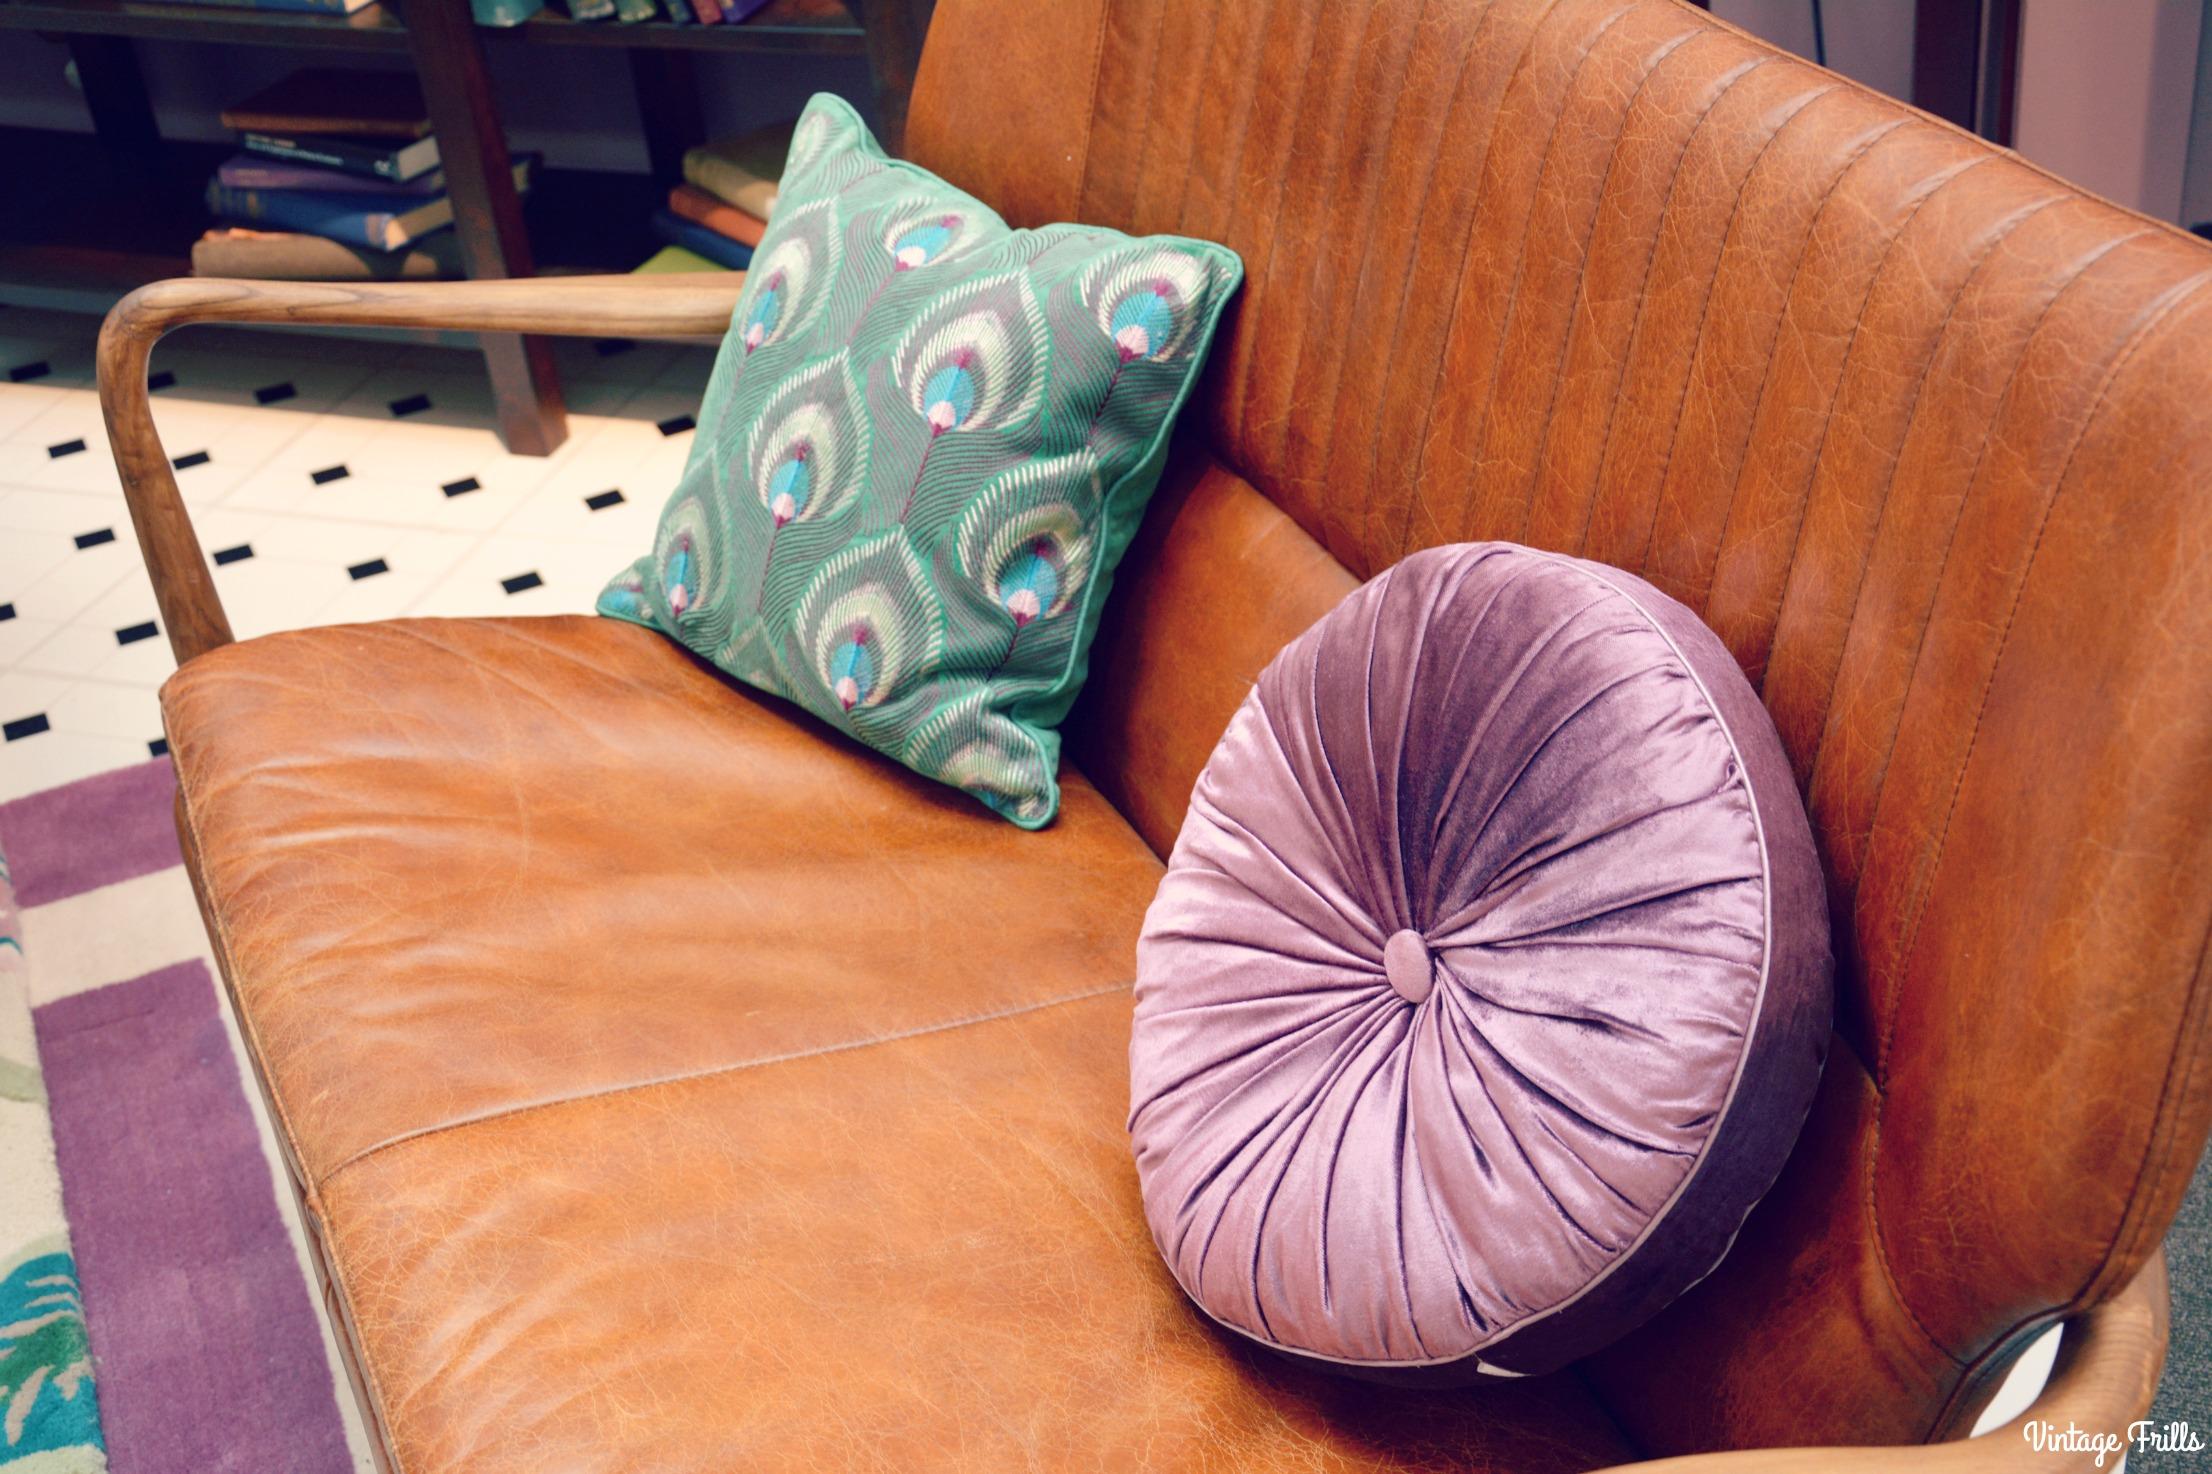 Laura Ashley Leather Sofa and Cushions